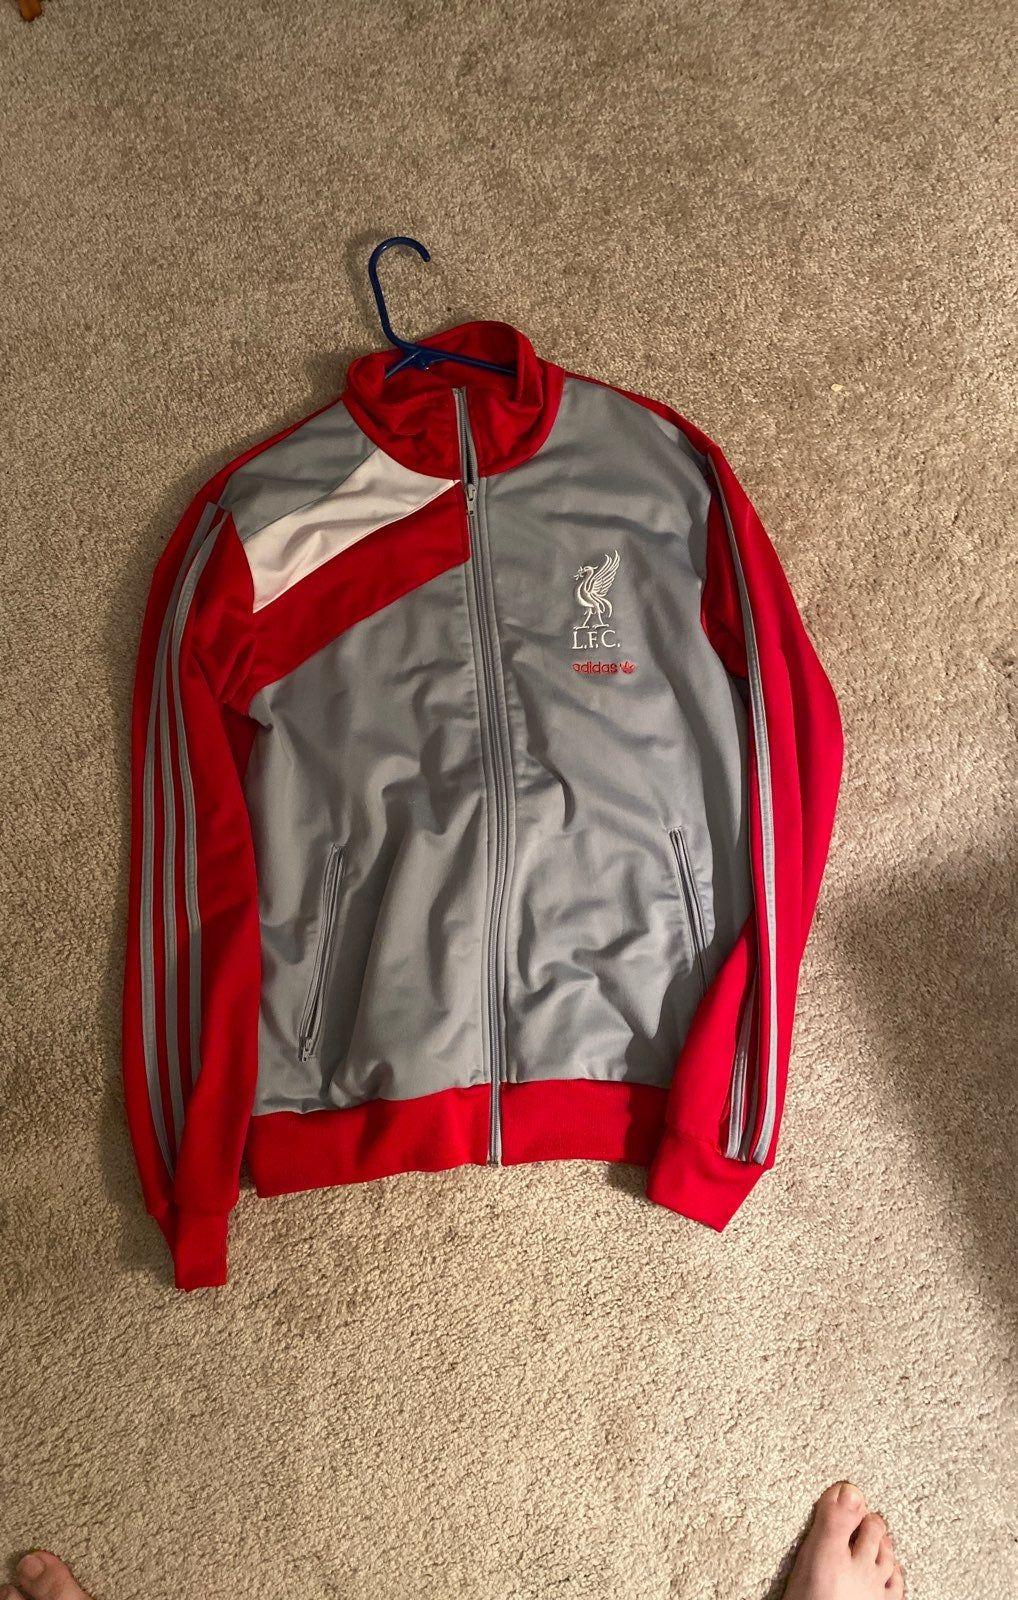 Adidas Lfc Liverpool Football Club Track Jacket Size Large Mens Sweatshirts Hoodie Jackets Track Jackets [ 1600 x 1018 Pixel ]